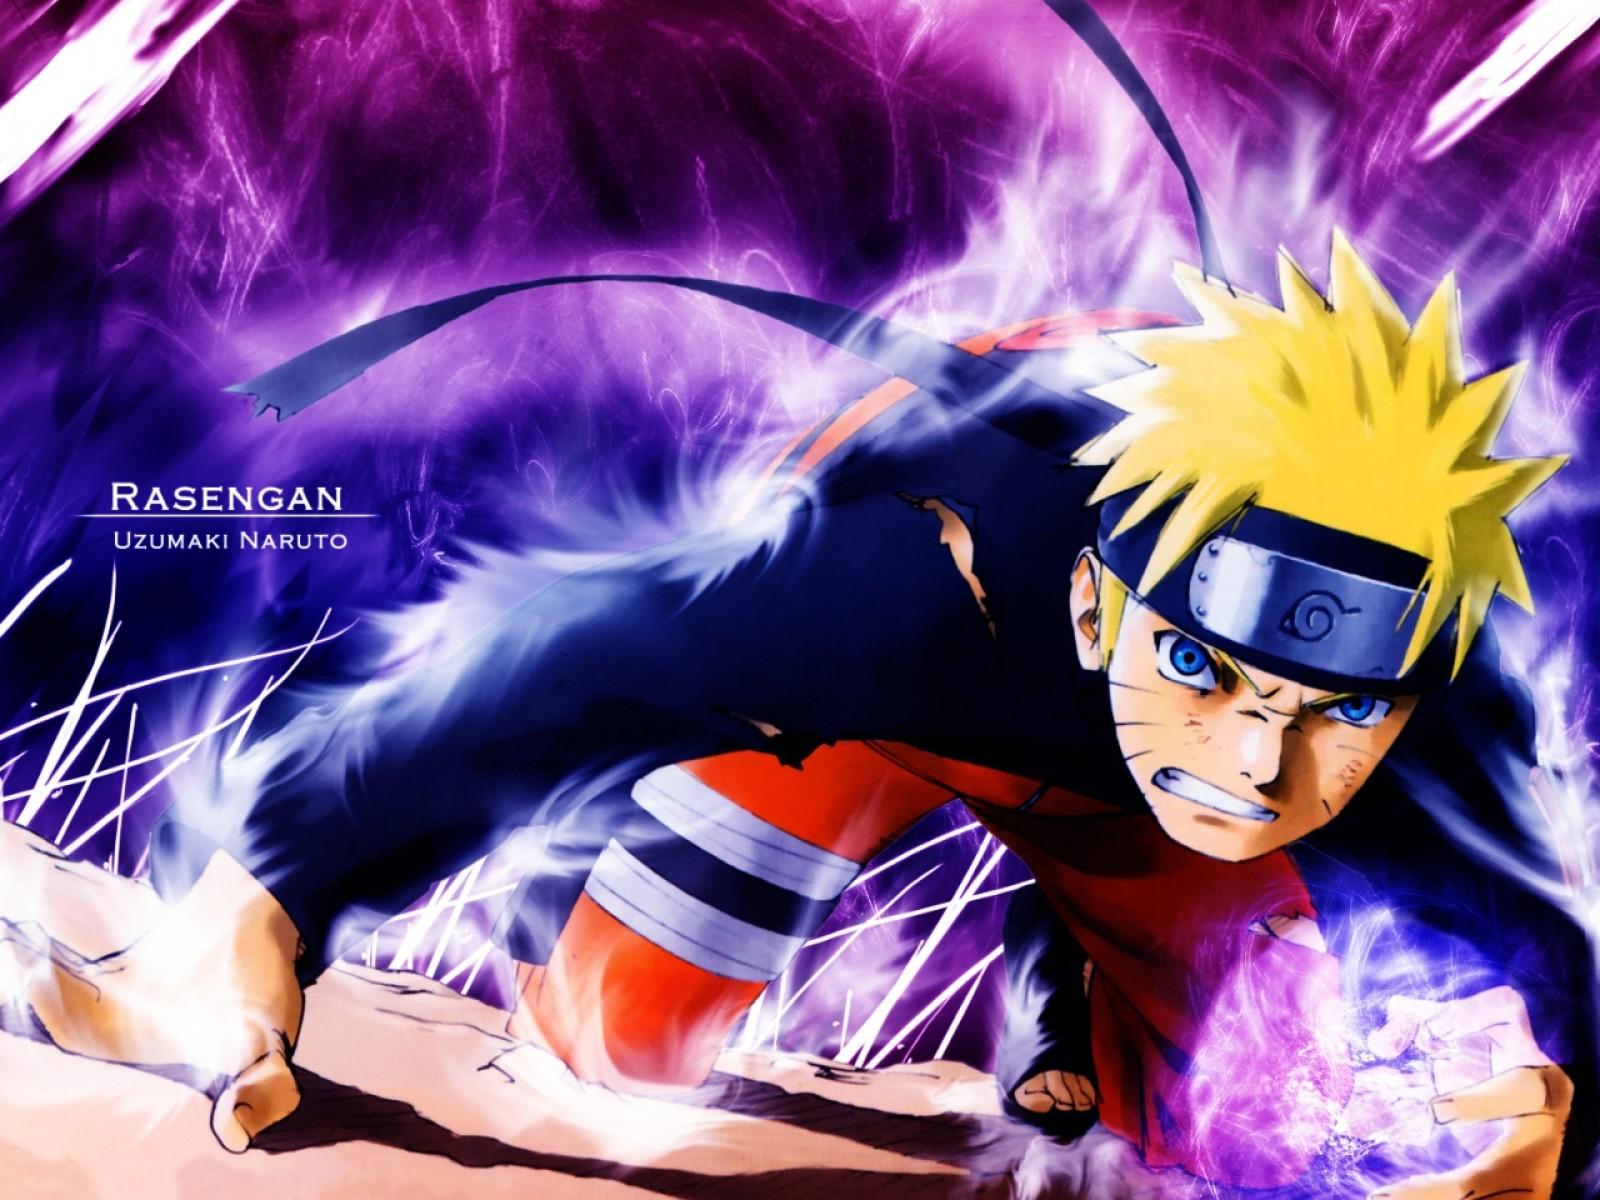 The Best Top Hd Desktop Naruto Shippuden Wallpaper Wallpapers 1